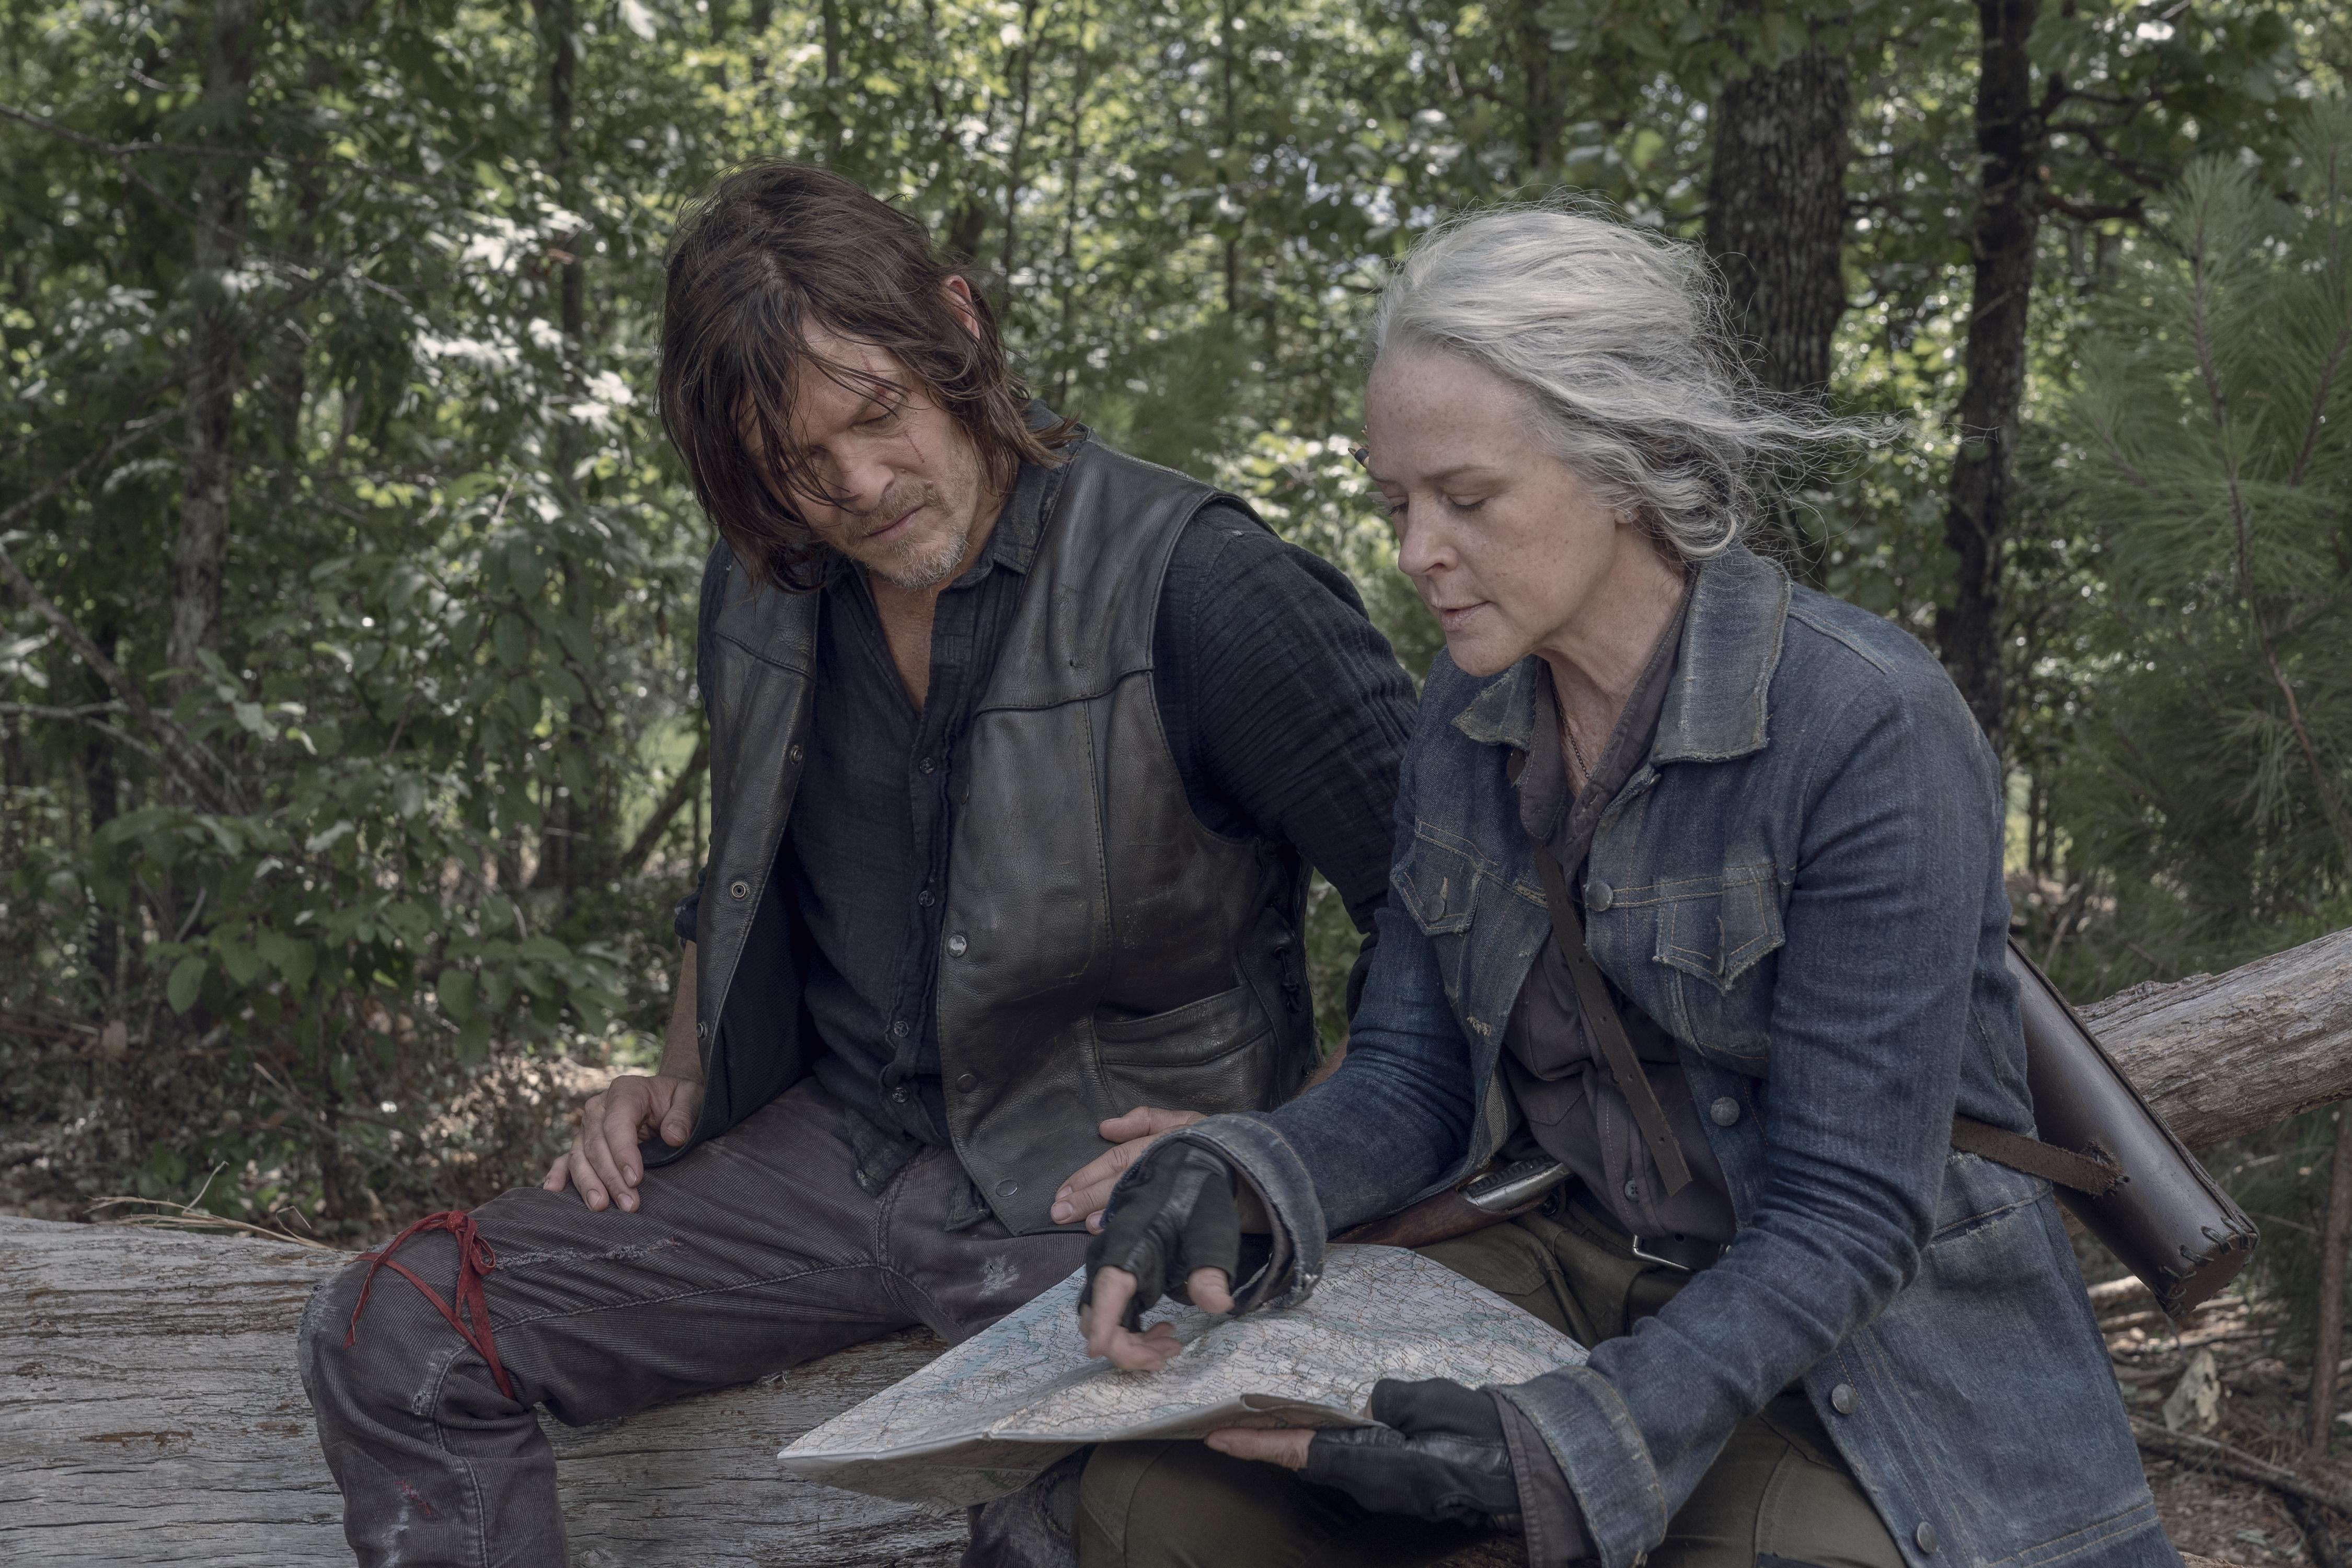 Norman Reedus as Daryl Dixon, Melissa McBride as Carol Peletier in The Walking Dead Season 10